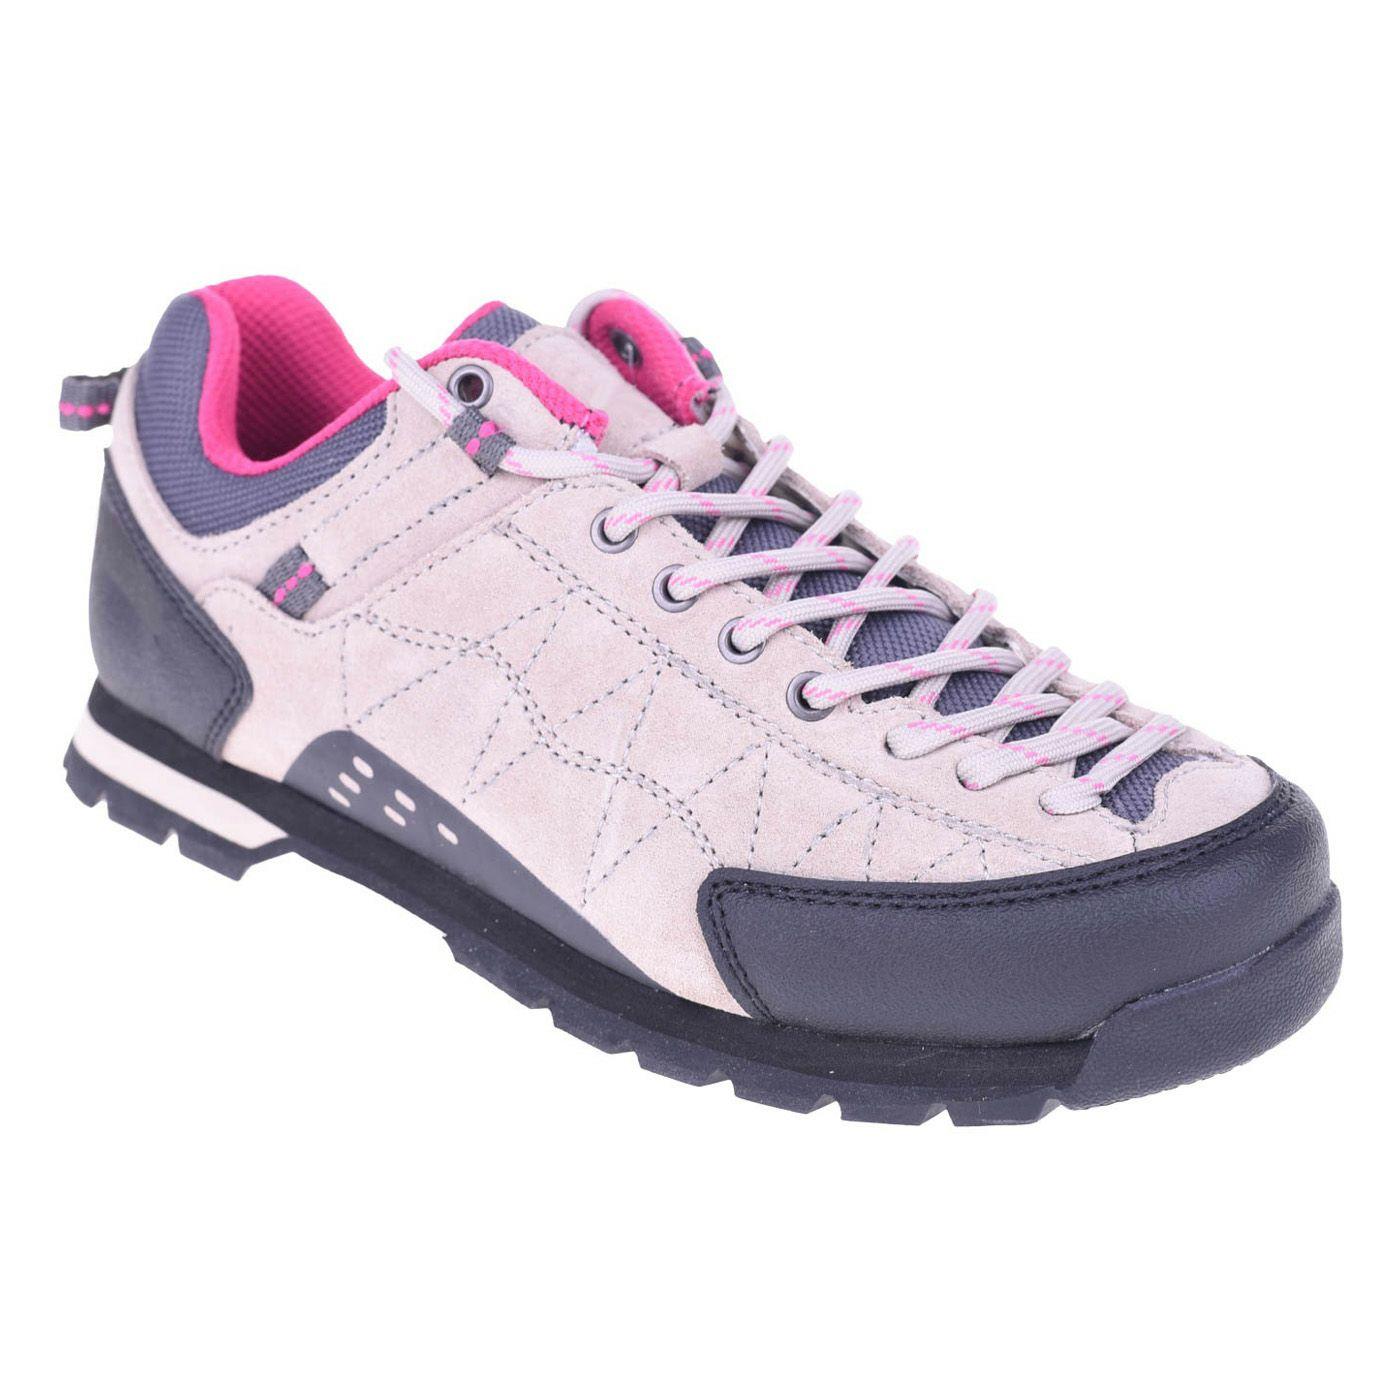 Buty damskie trekkingowe HI-TEC